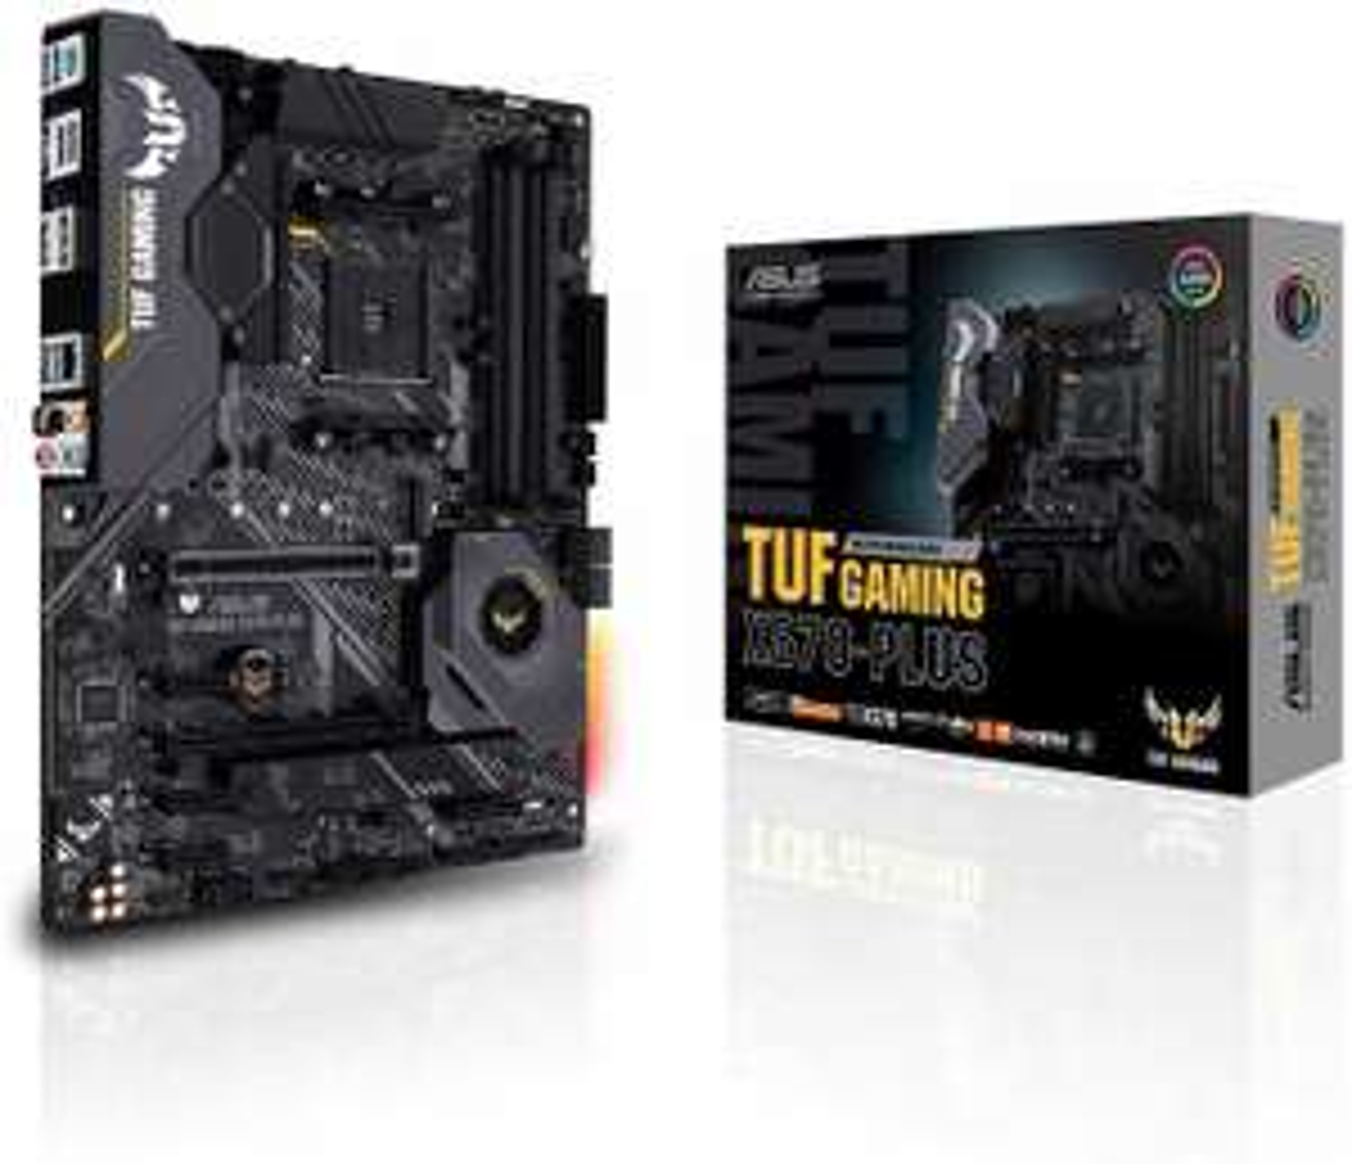 Asus TUF Gaming X570-Plus ATX Mainboard - Sockel AM4 (Amazon)